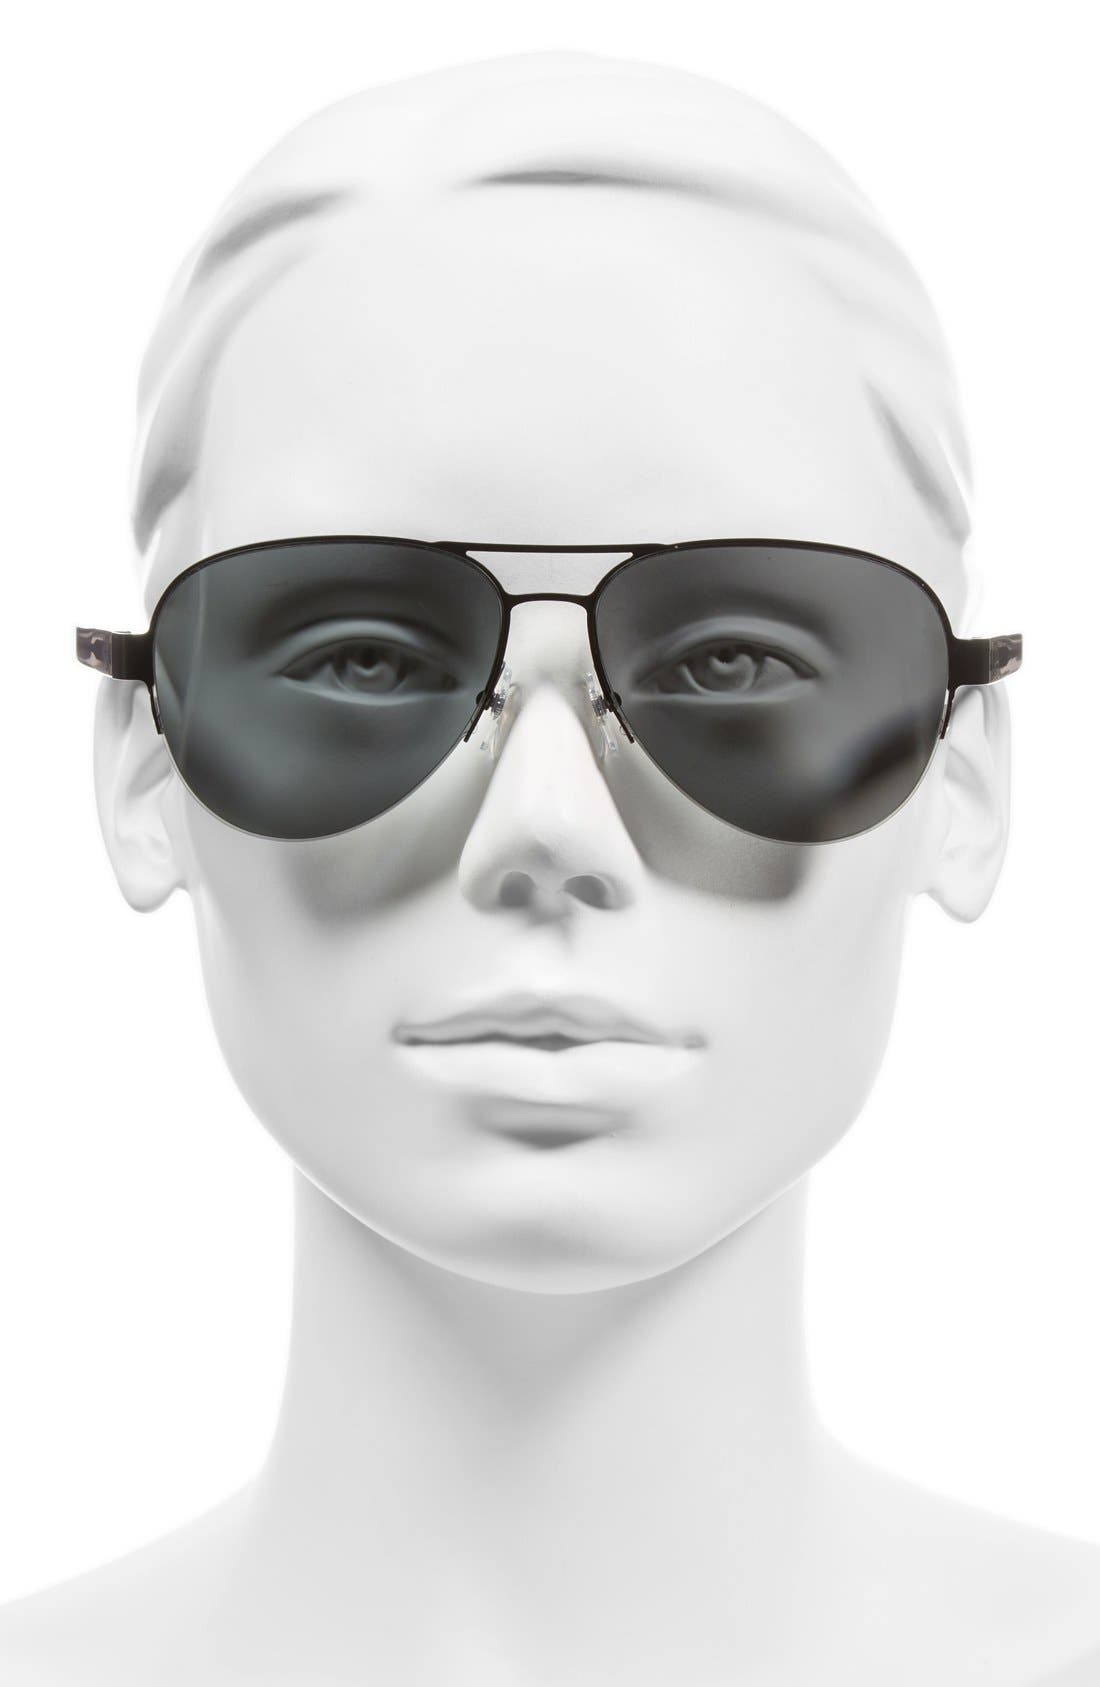 59mm Aviator Sunglasses,                             Alternate thumbnail 2, color,                             001